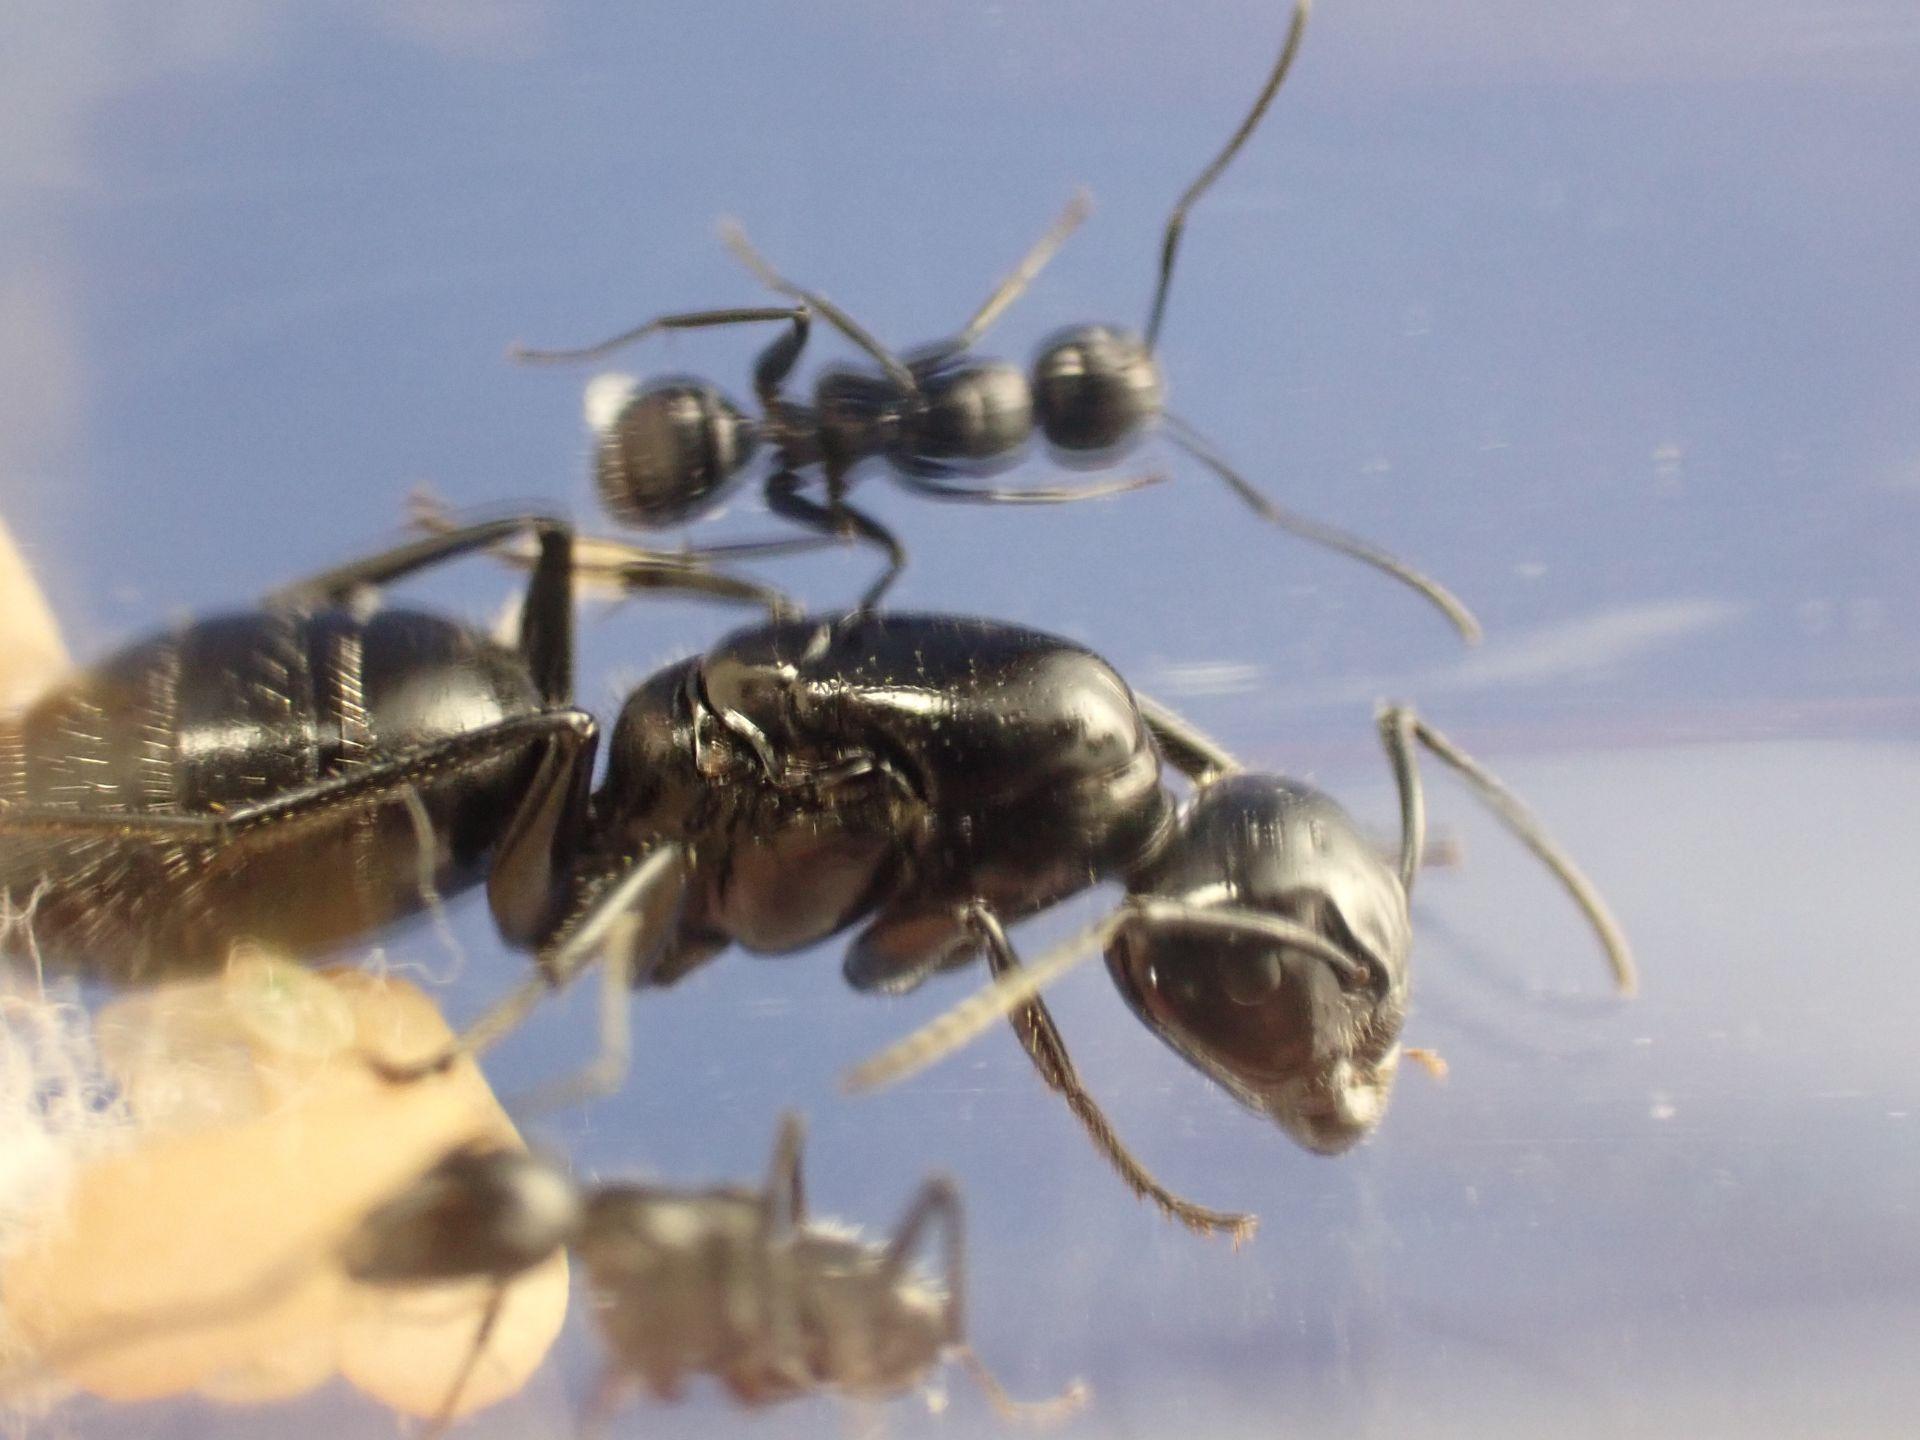 Camponotus laevigatus colony 1 (2)